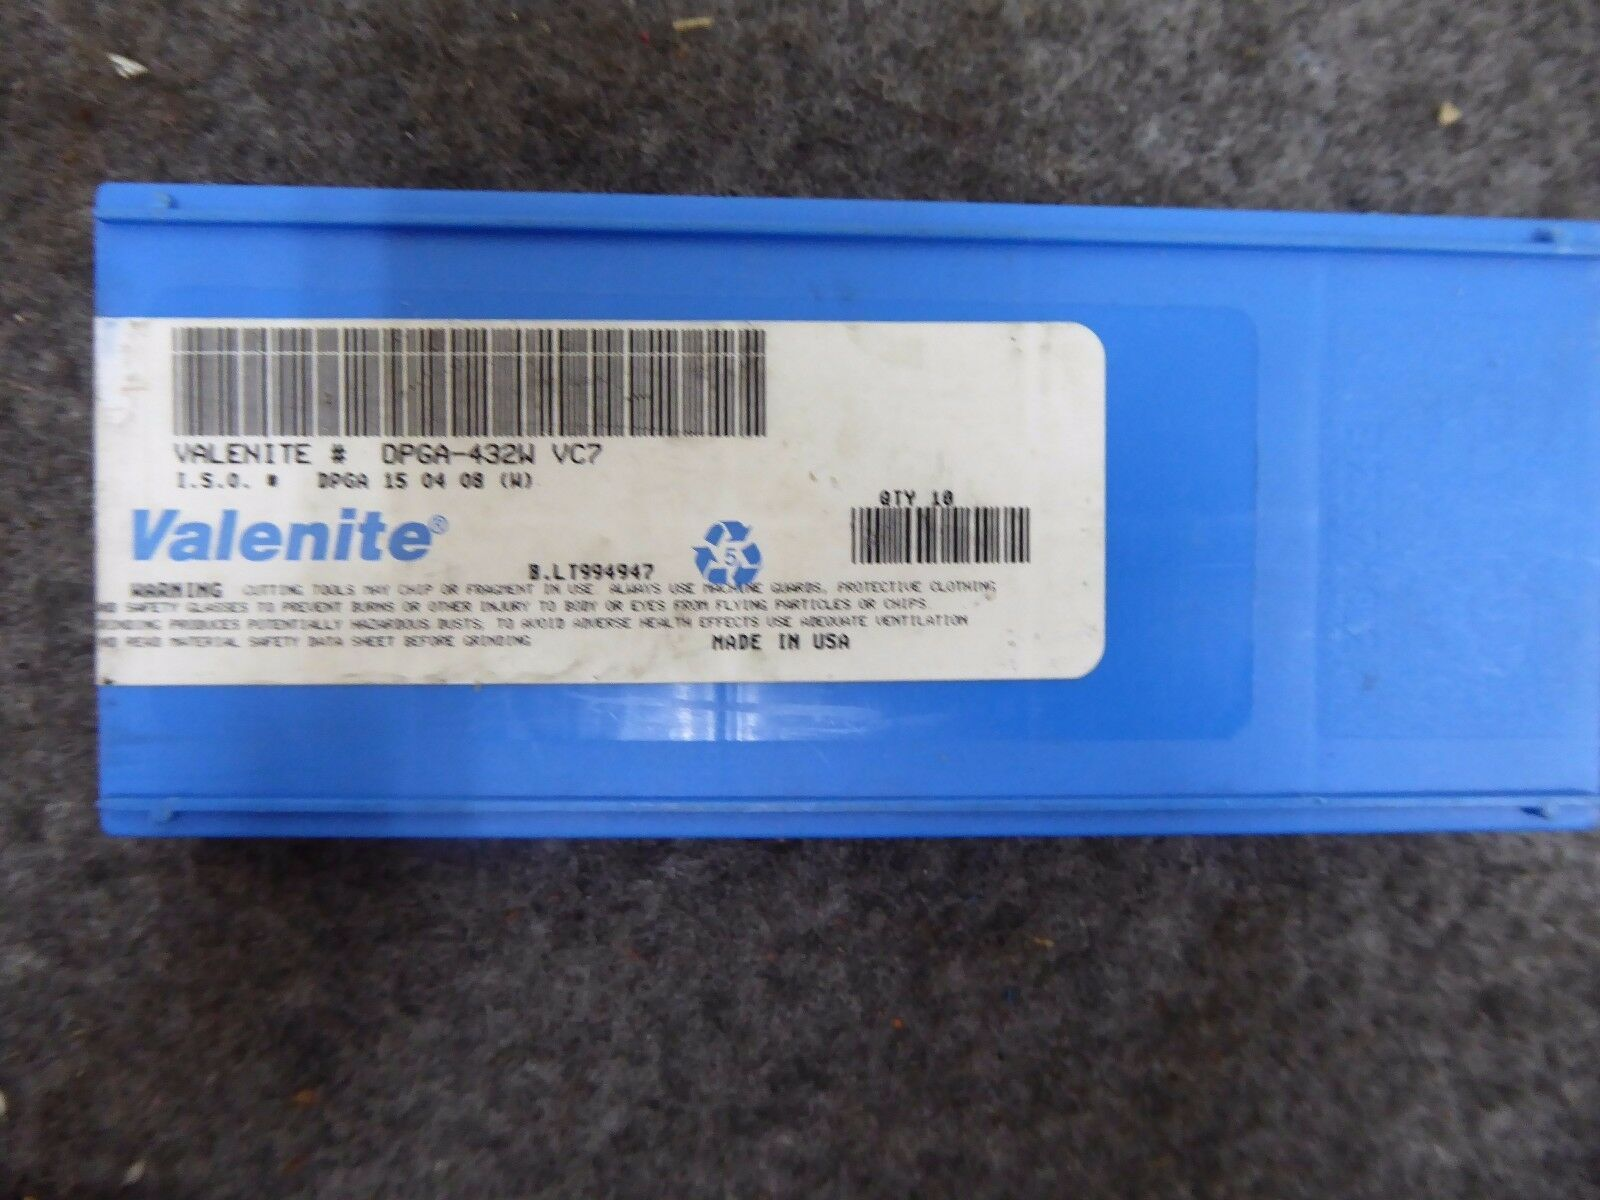 Valenite DPGA-432W Carbide Inserts Pack of 10 VC7